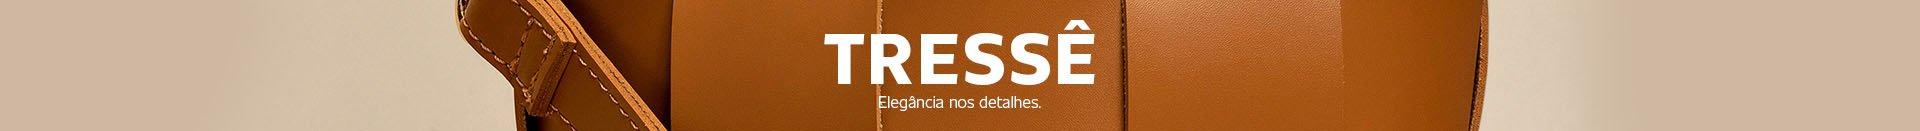 Banner-Tressê-desktop-categoria.jpg